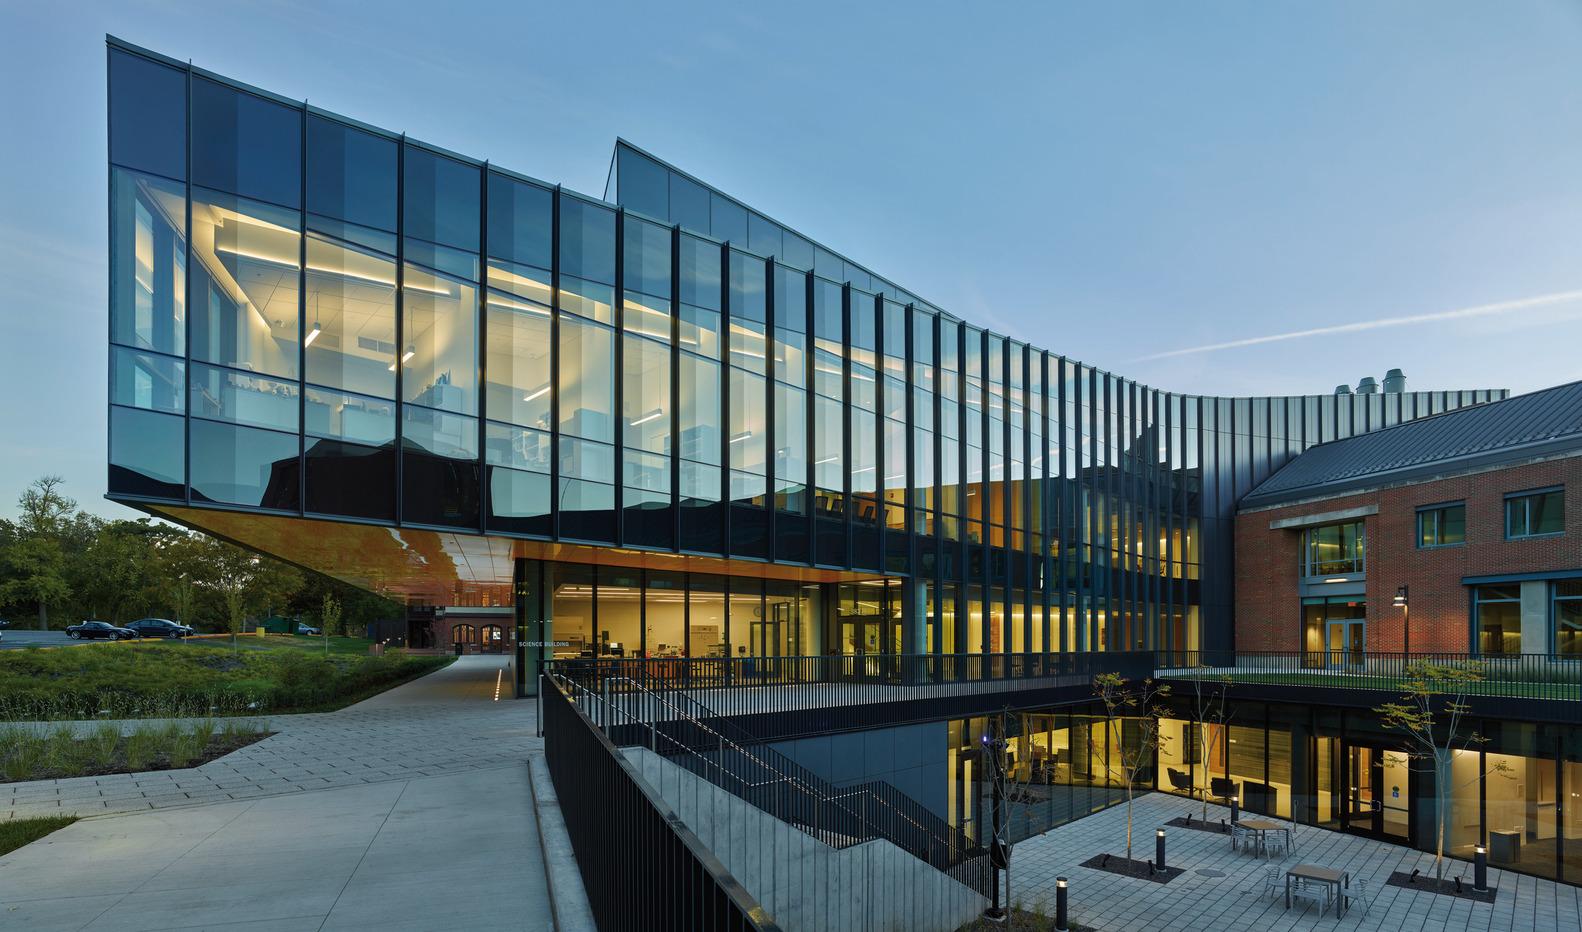 Browning Hall Interdisciplinary Science Building